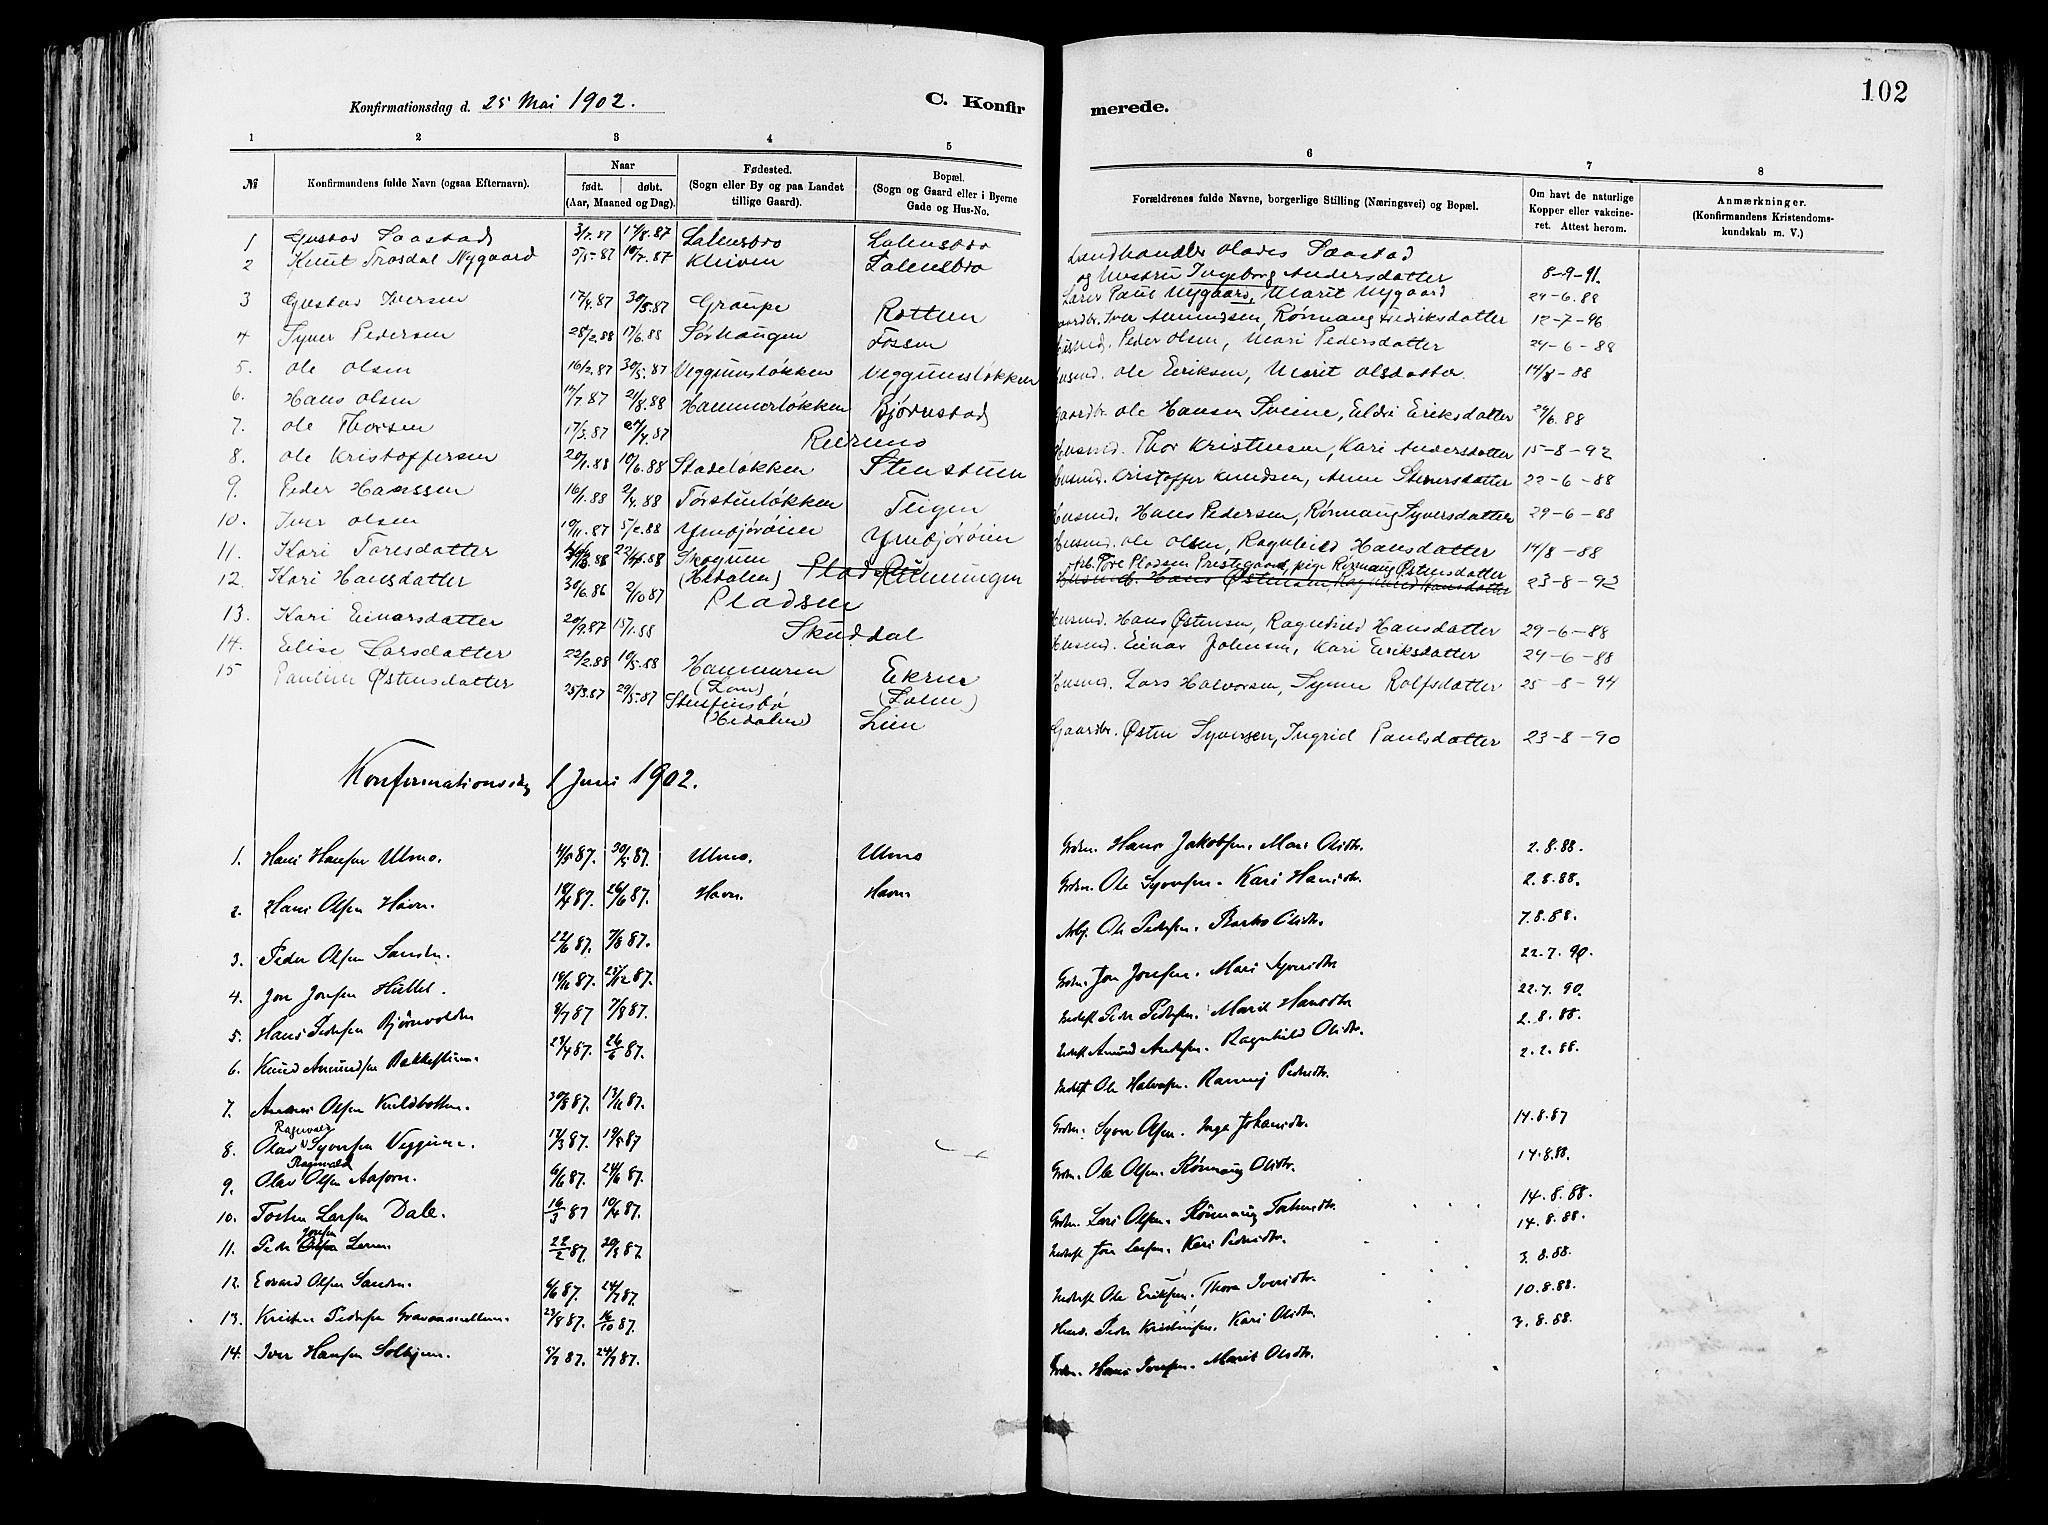 SAH, Vågå prestekontor, Ministerialbok nr. 8, 1886-1904, s. 102